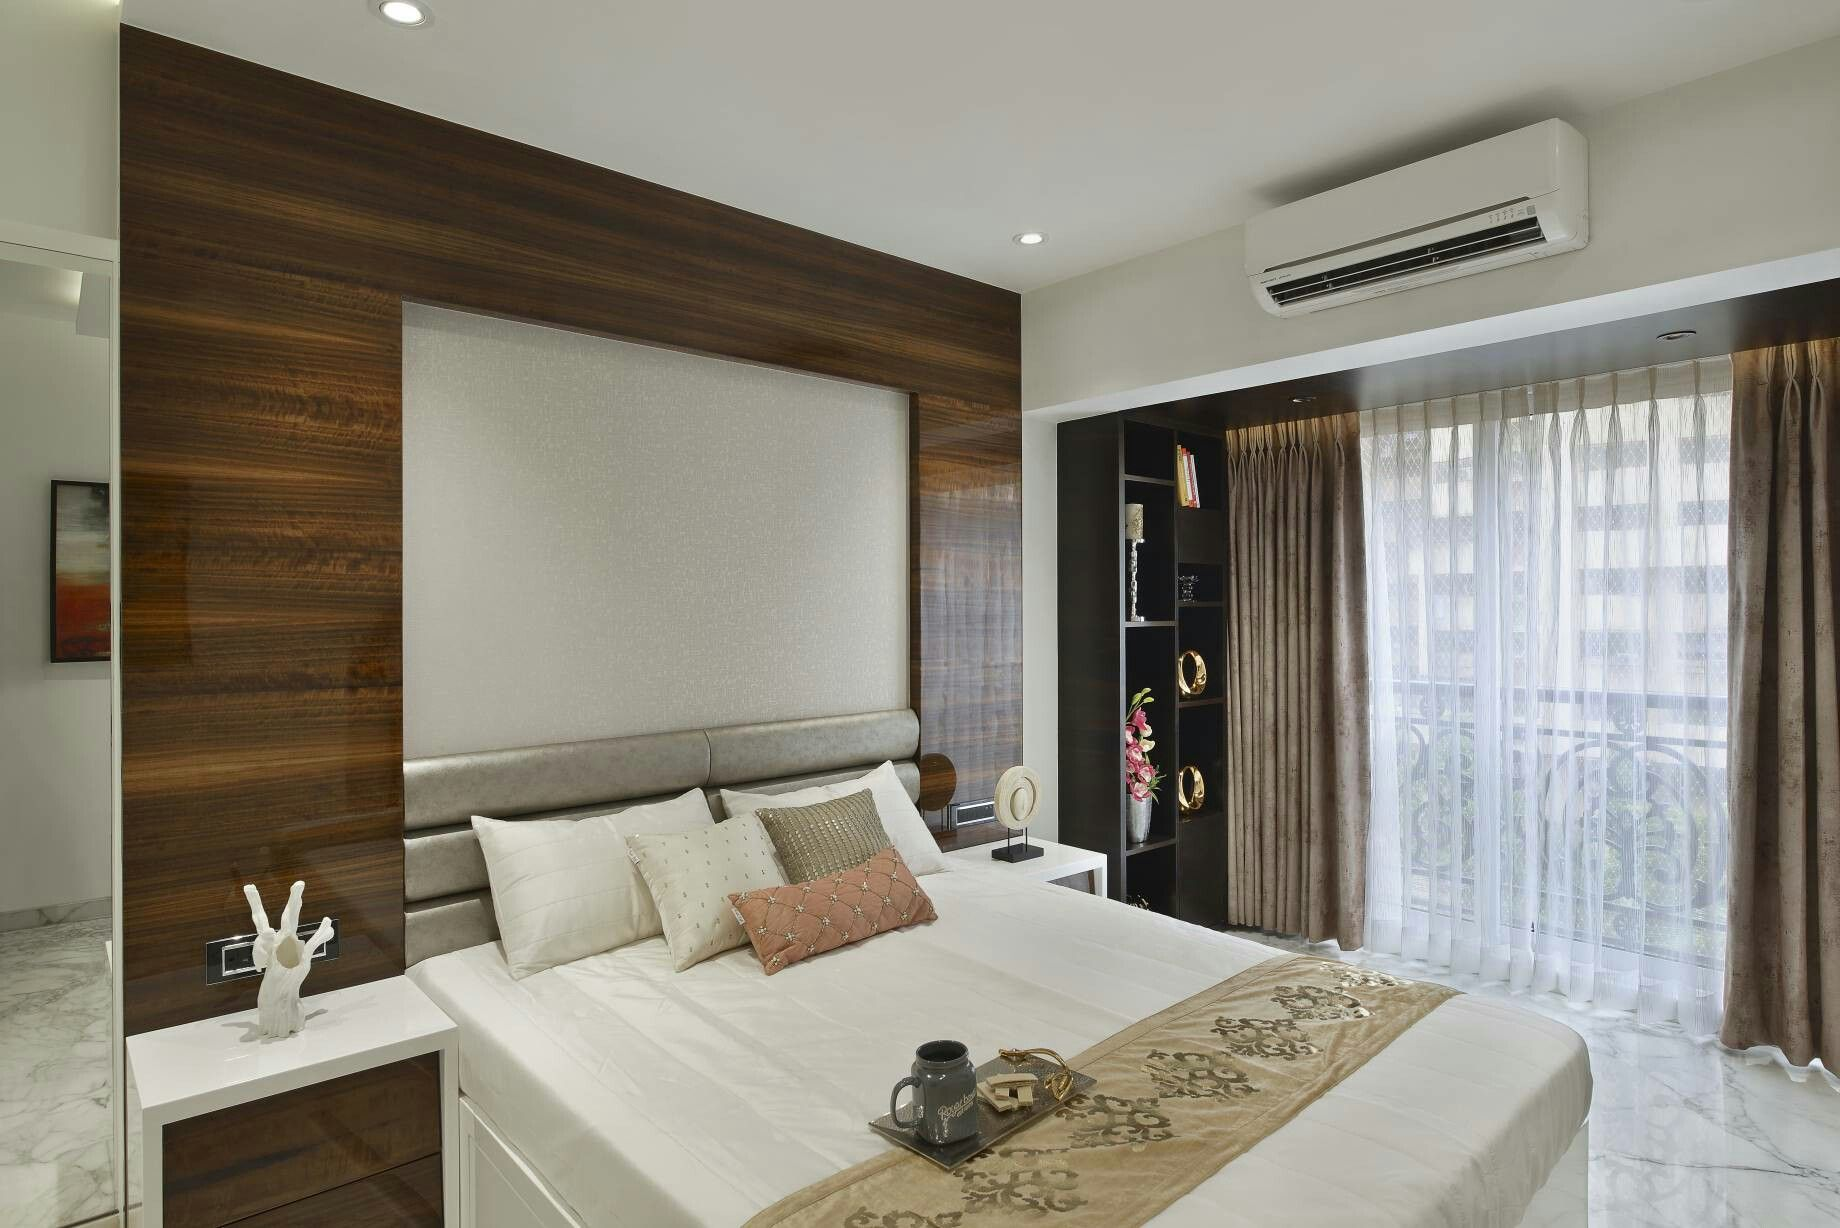 Pin by Ebrahim Micha on Room decor Bedroom bed design